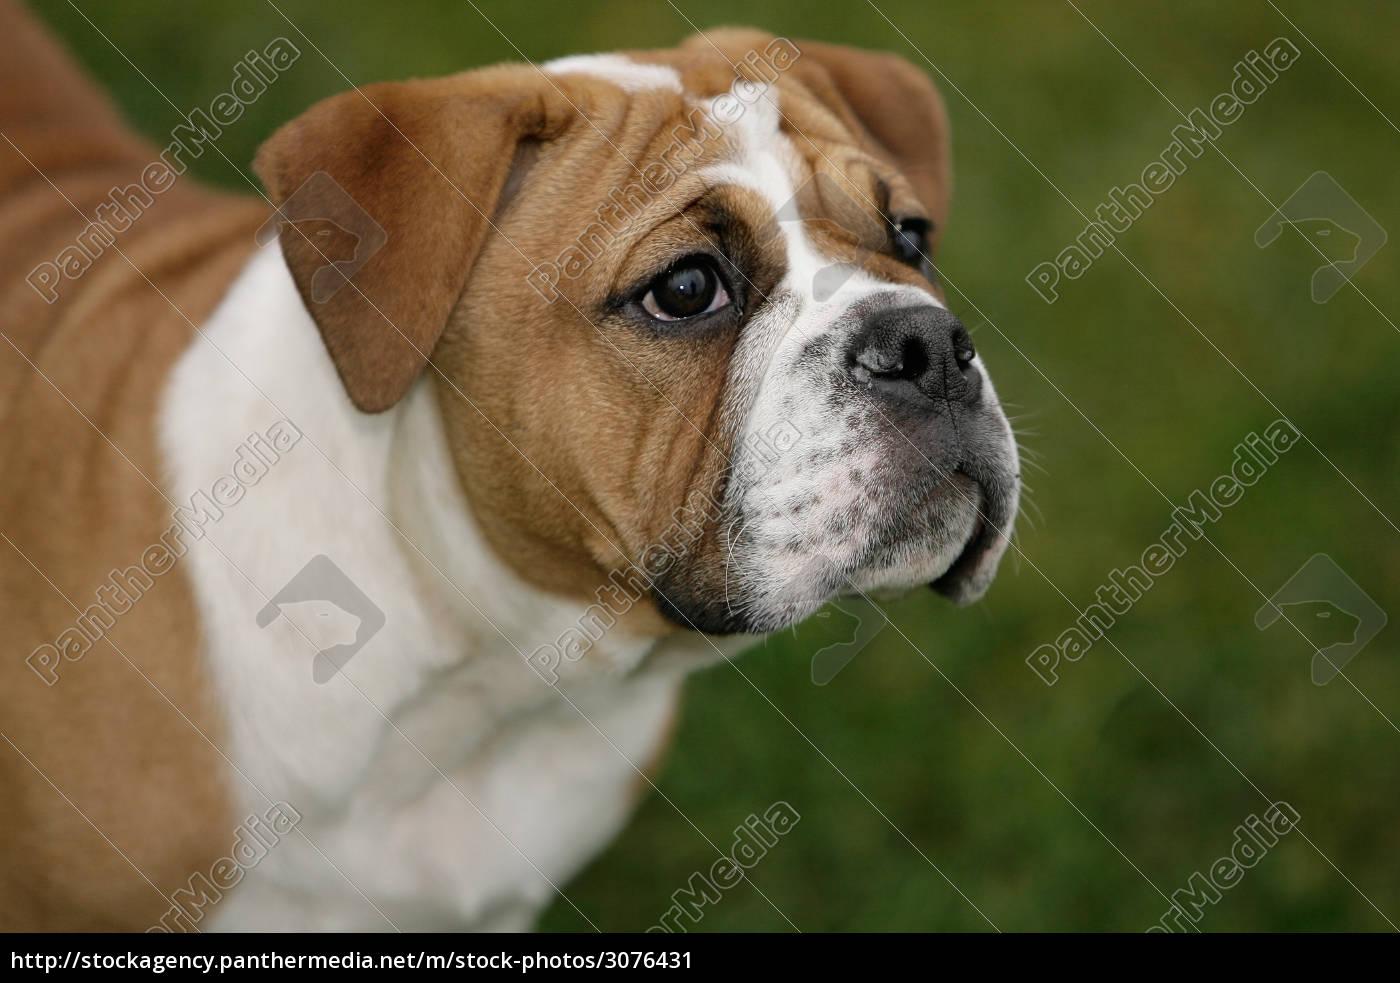 Continental Bulldog Puppy Royalty Free Image 3076431 Panthermedia Stock Agency